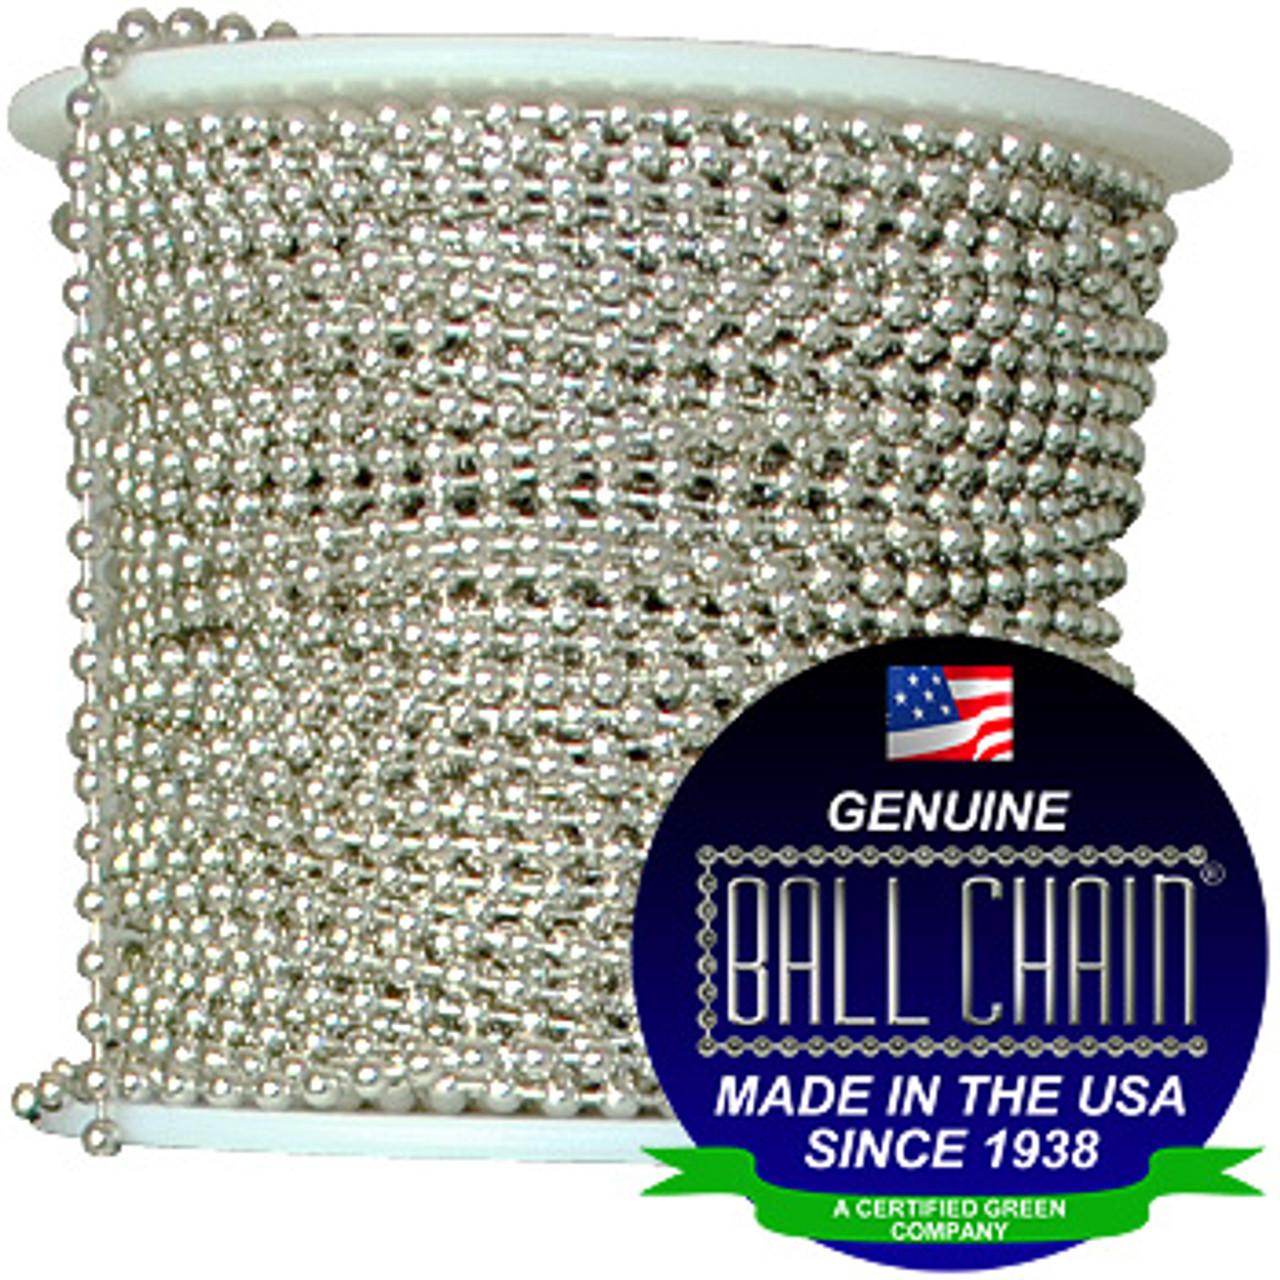 #2 Aluminum Ball Chain Spool that comes in 100 feet, 250 feet, 500 feet, 1000 feet and 200 feet. It is also known as #2 aluminum bead chain spool.